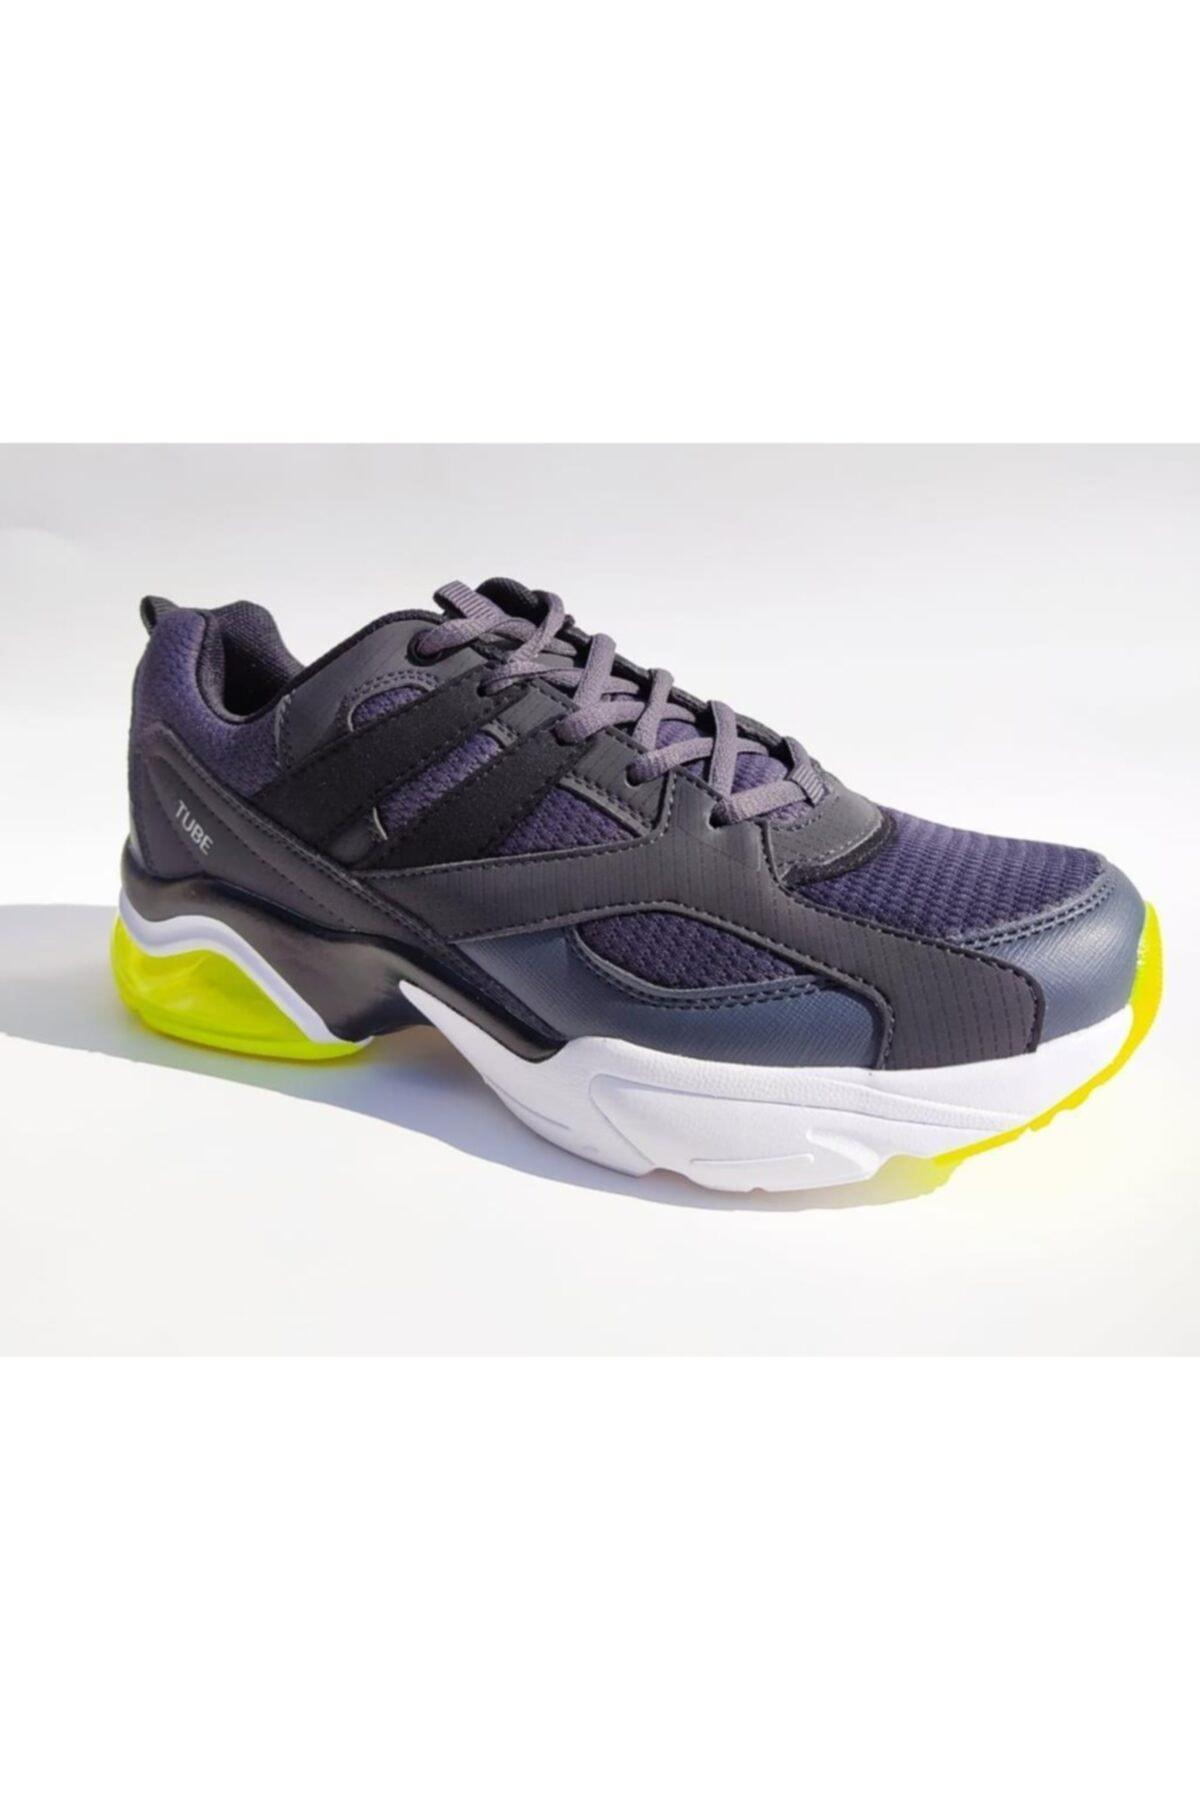 Lescon 20na27638 Airtube Unisex Günlük Rahat Spor Ayakkabı 1